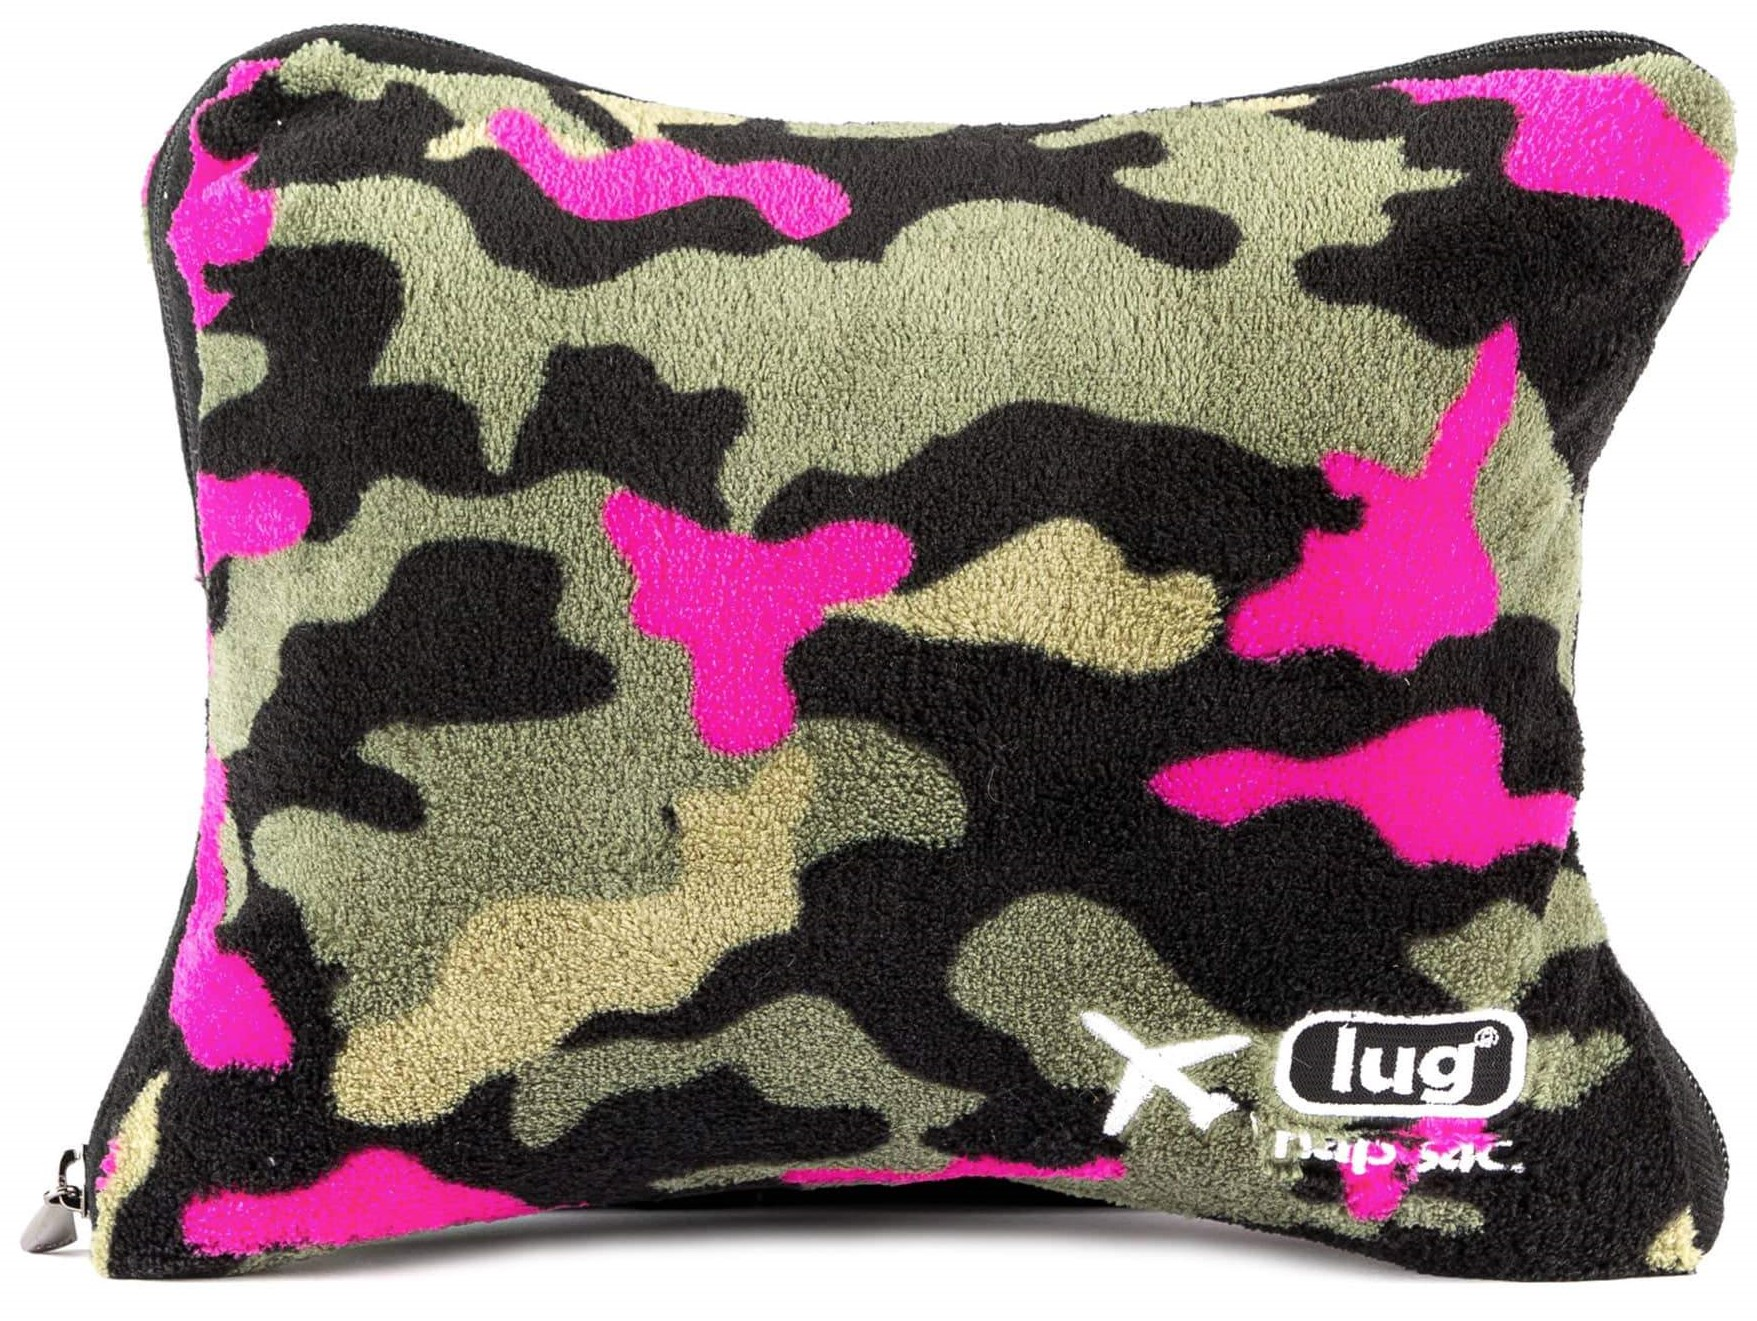 lug nap sac travel pillow blanket camo orchid